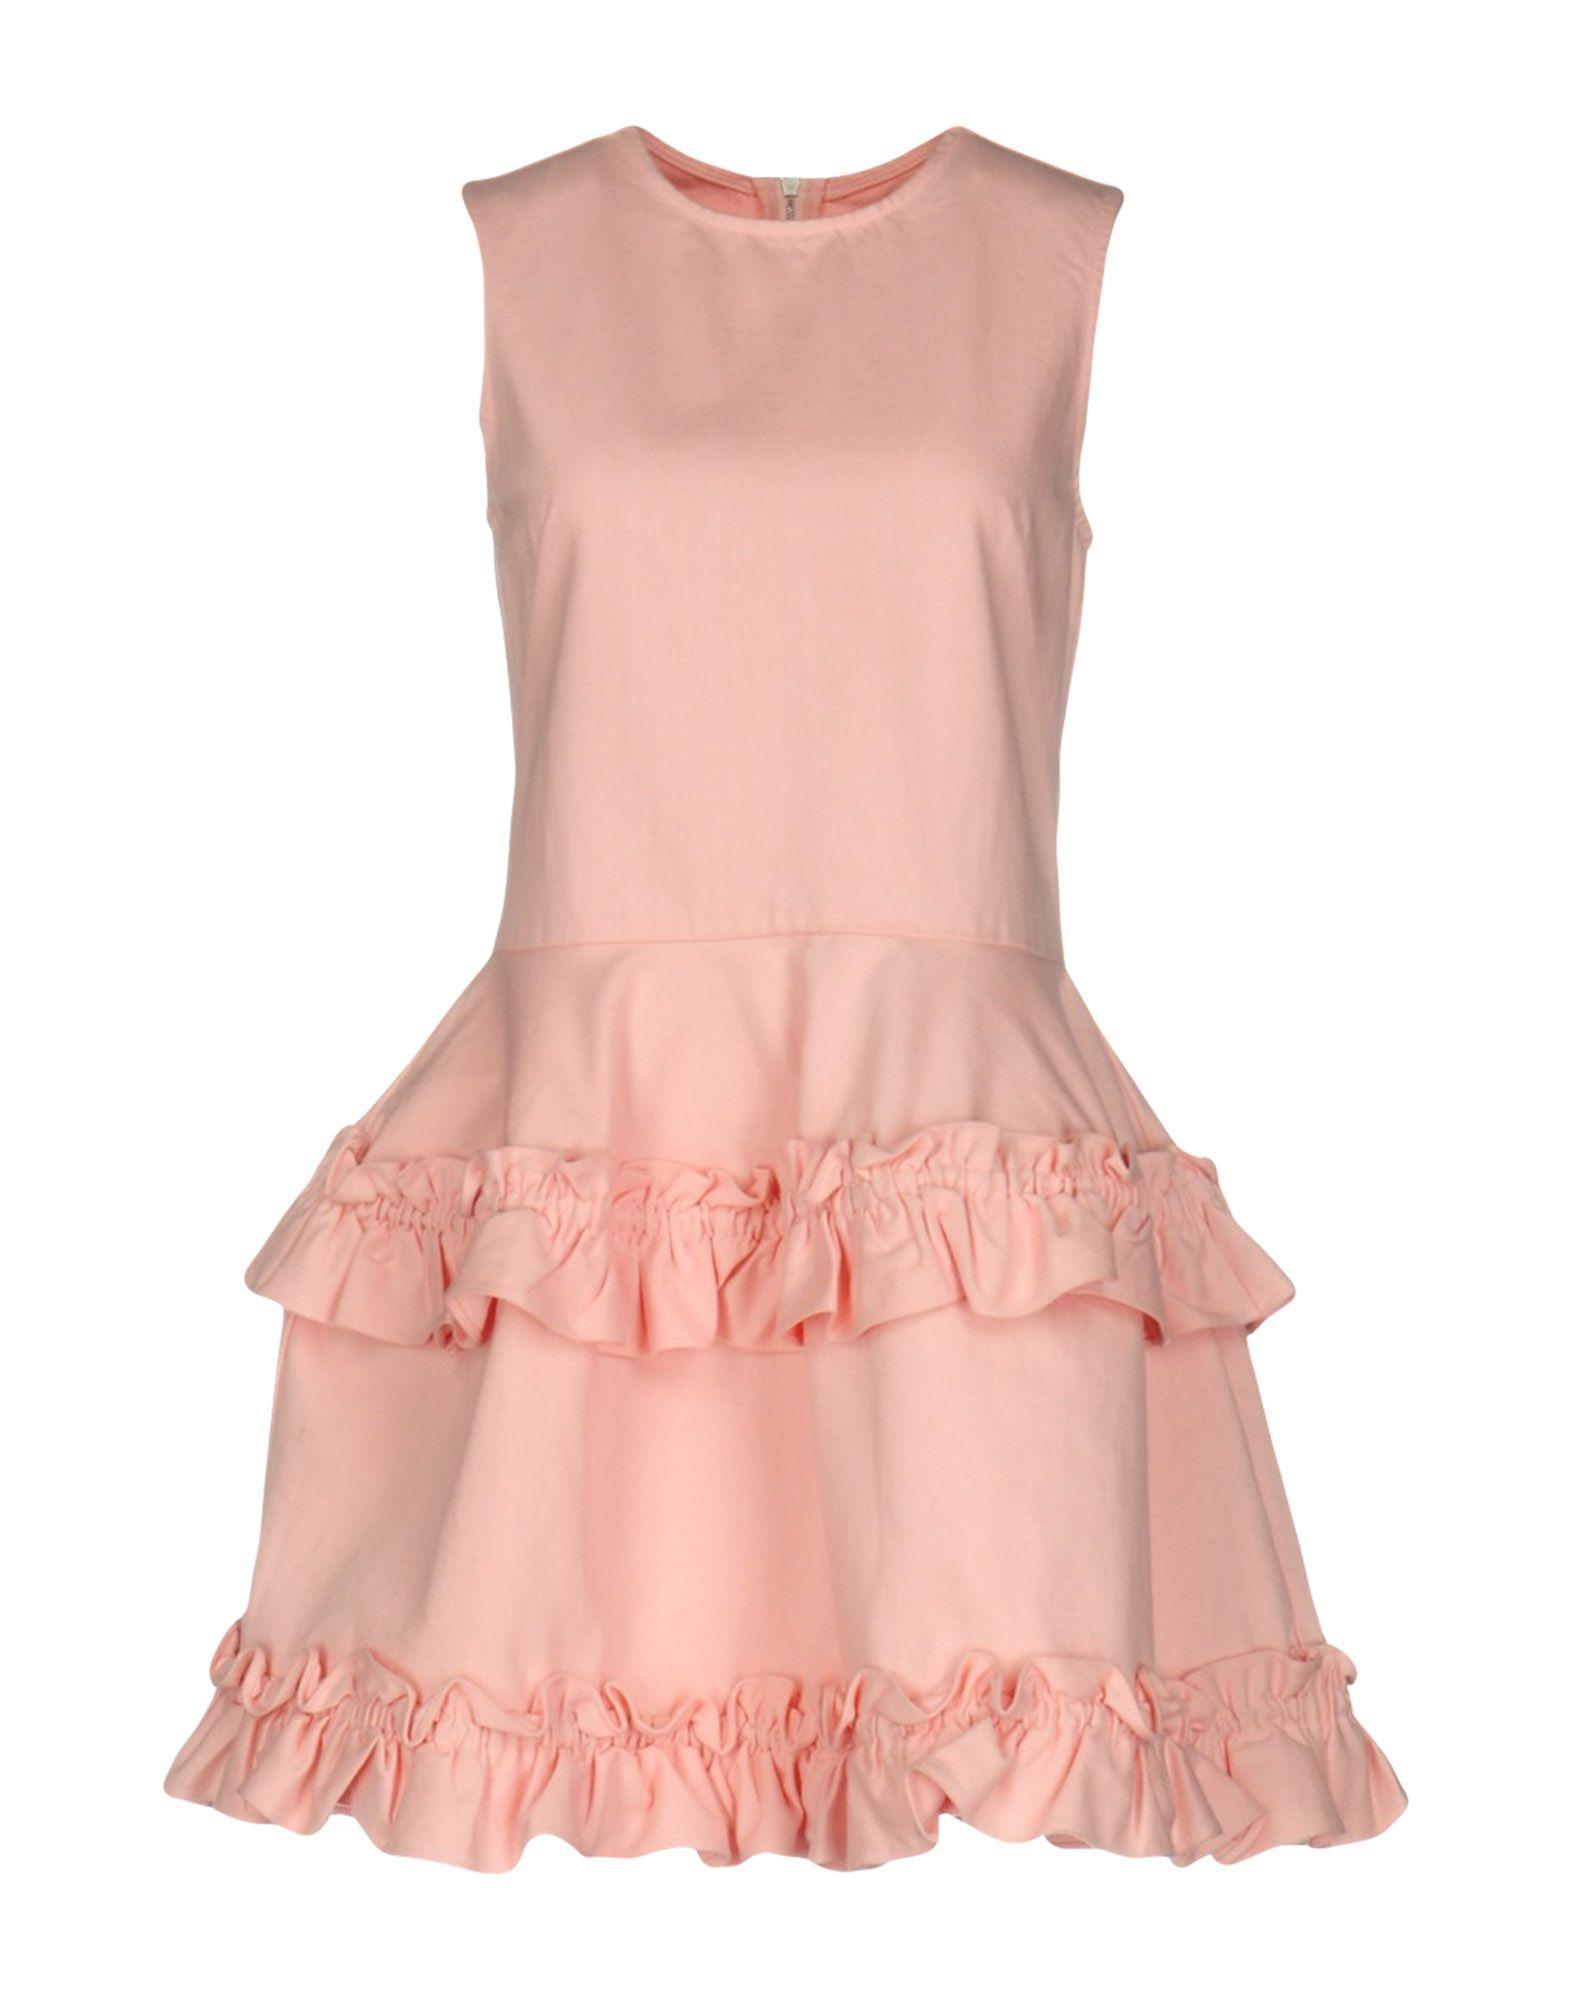 SIMONE ROCHA X J BRAND Short Dress in Pink